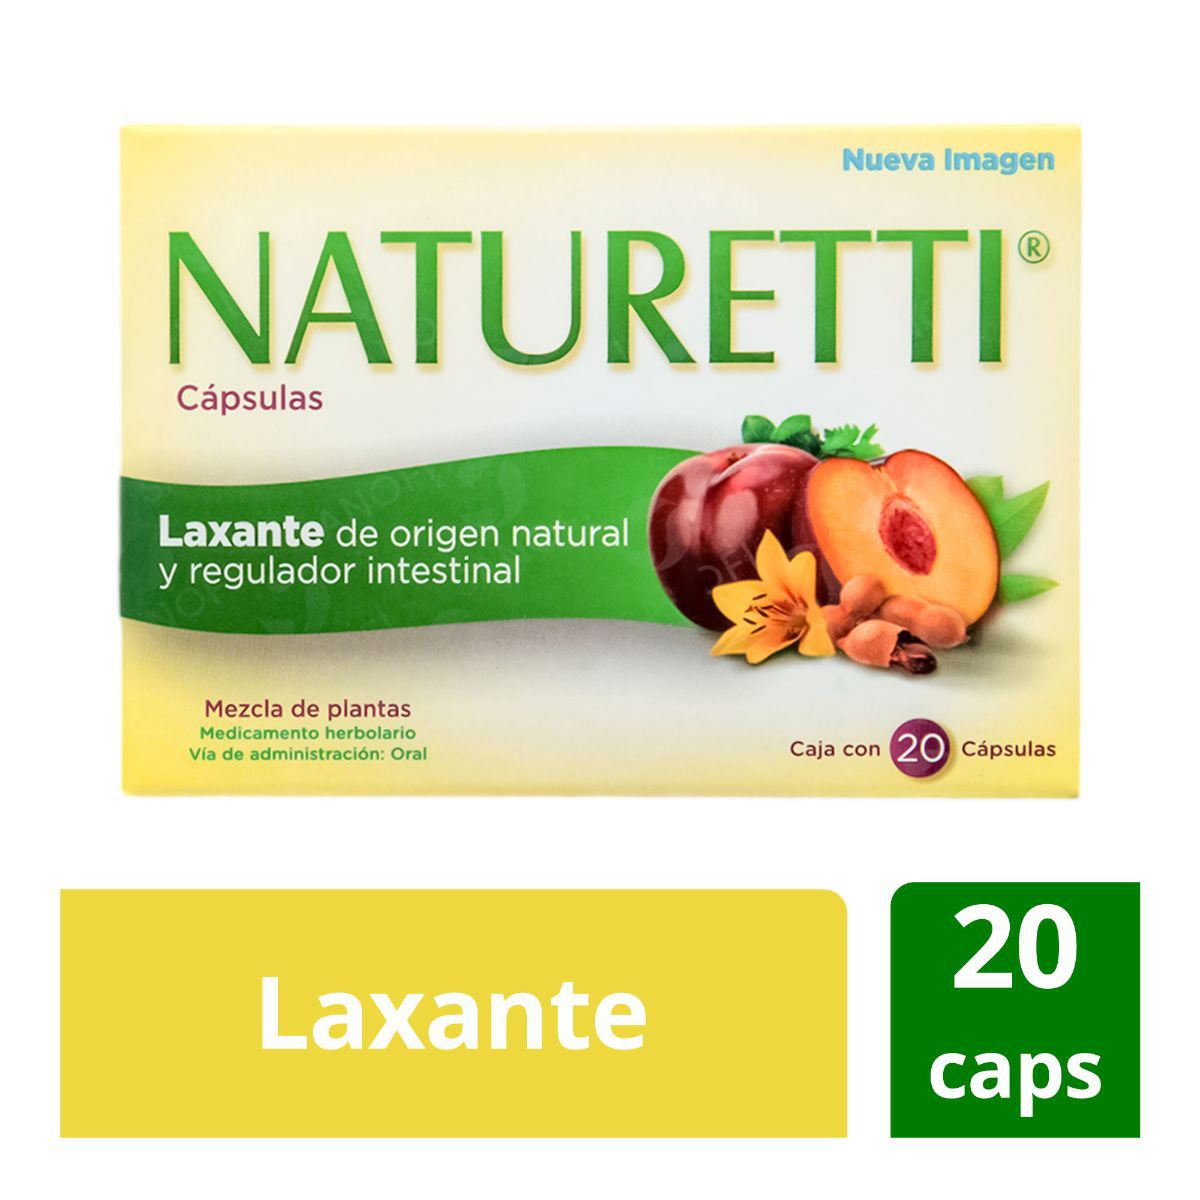 Naturetti 20 cápsulas  - Sanborns